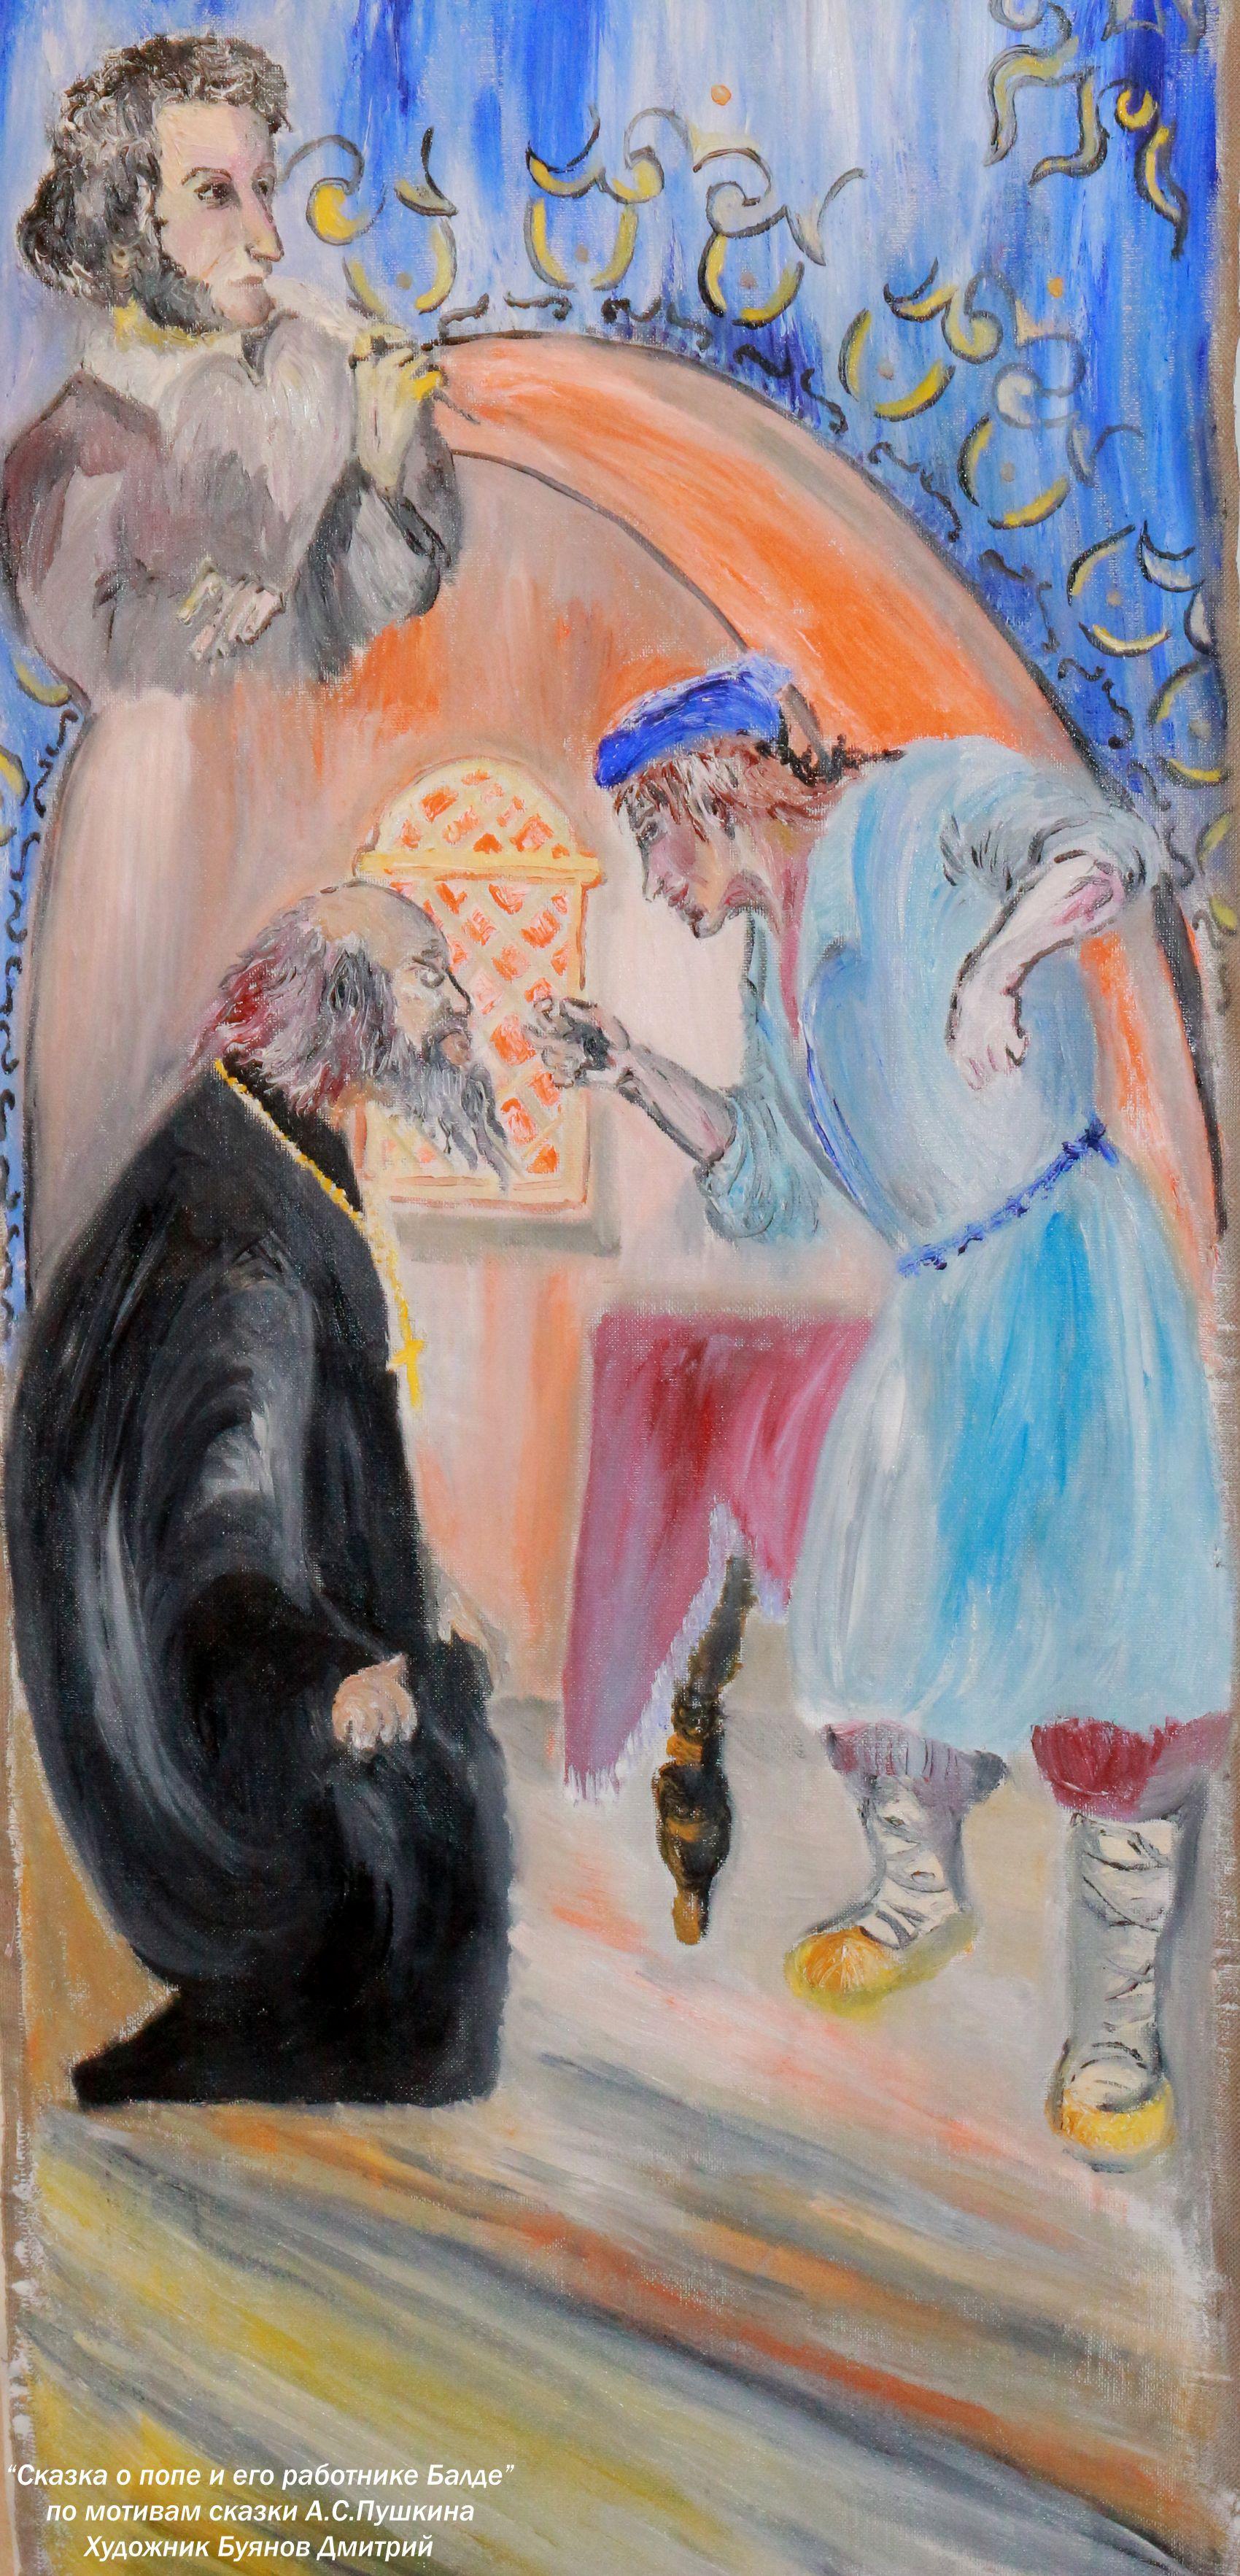 "Дмитрий Юрьевич Буянов. ""The tale about priest and his worker Balda"" based on the tale A. S. Pushkin the Artist Dmitry Buyanov"